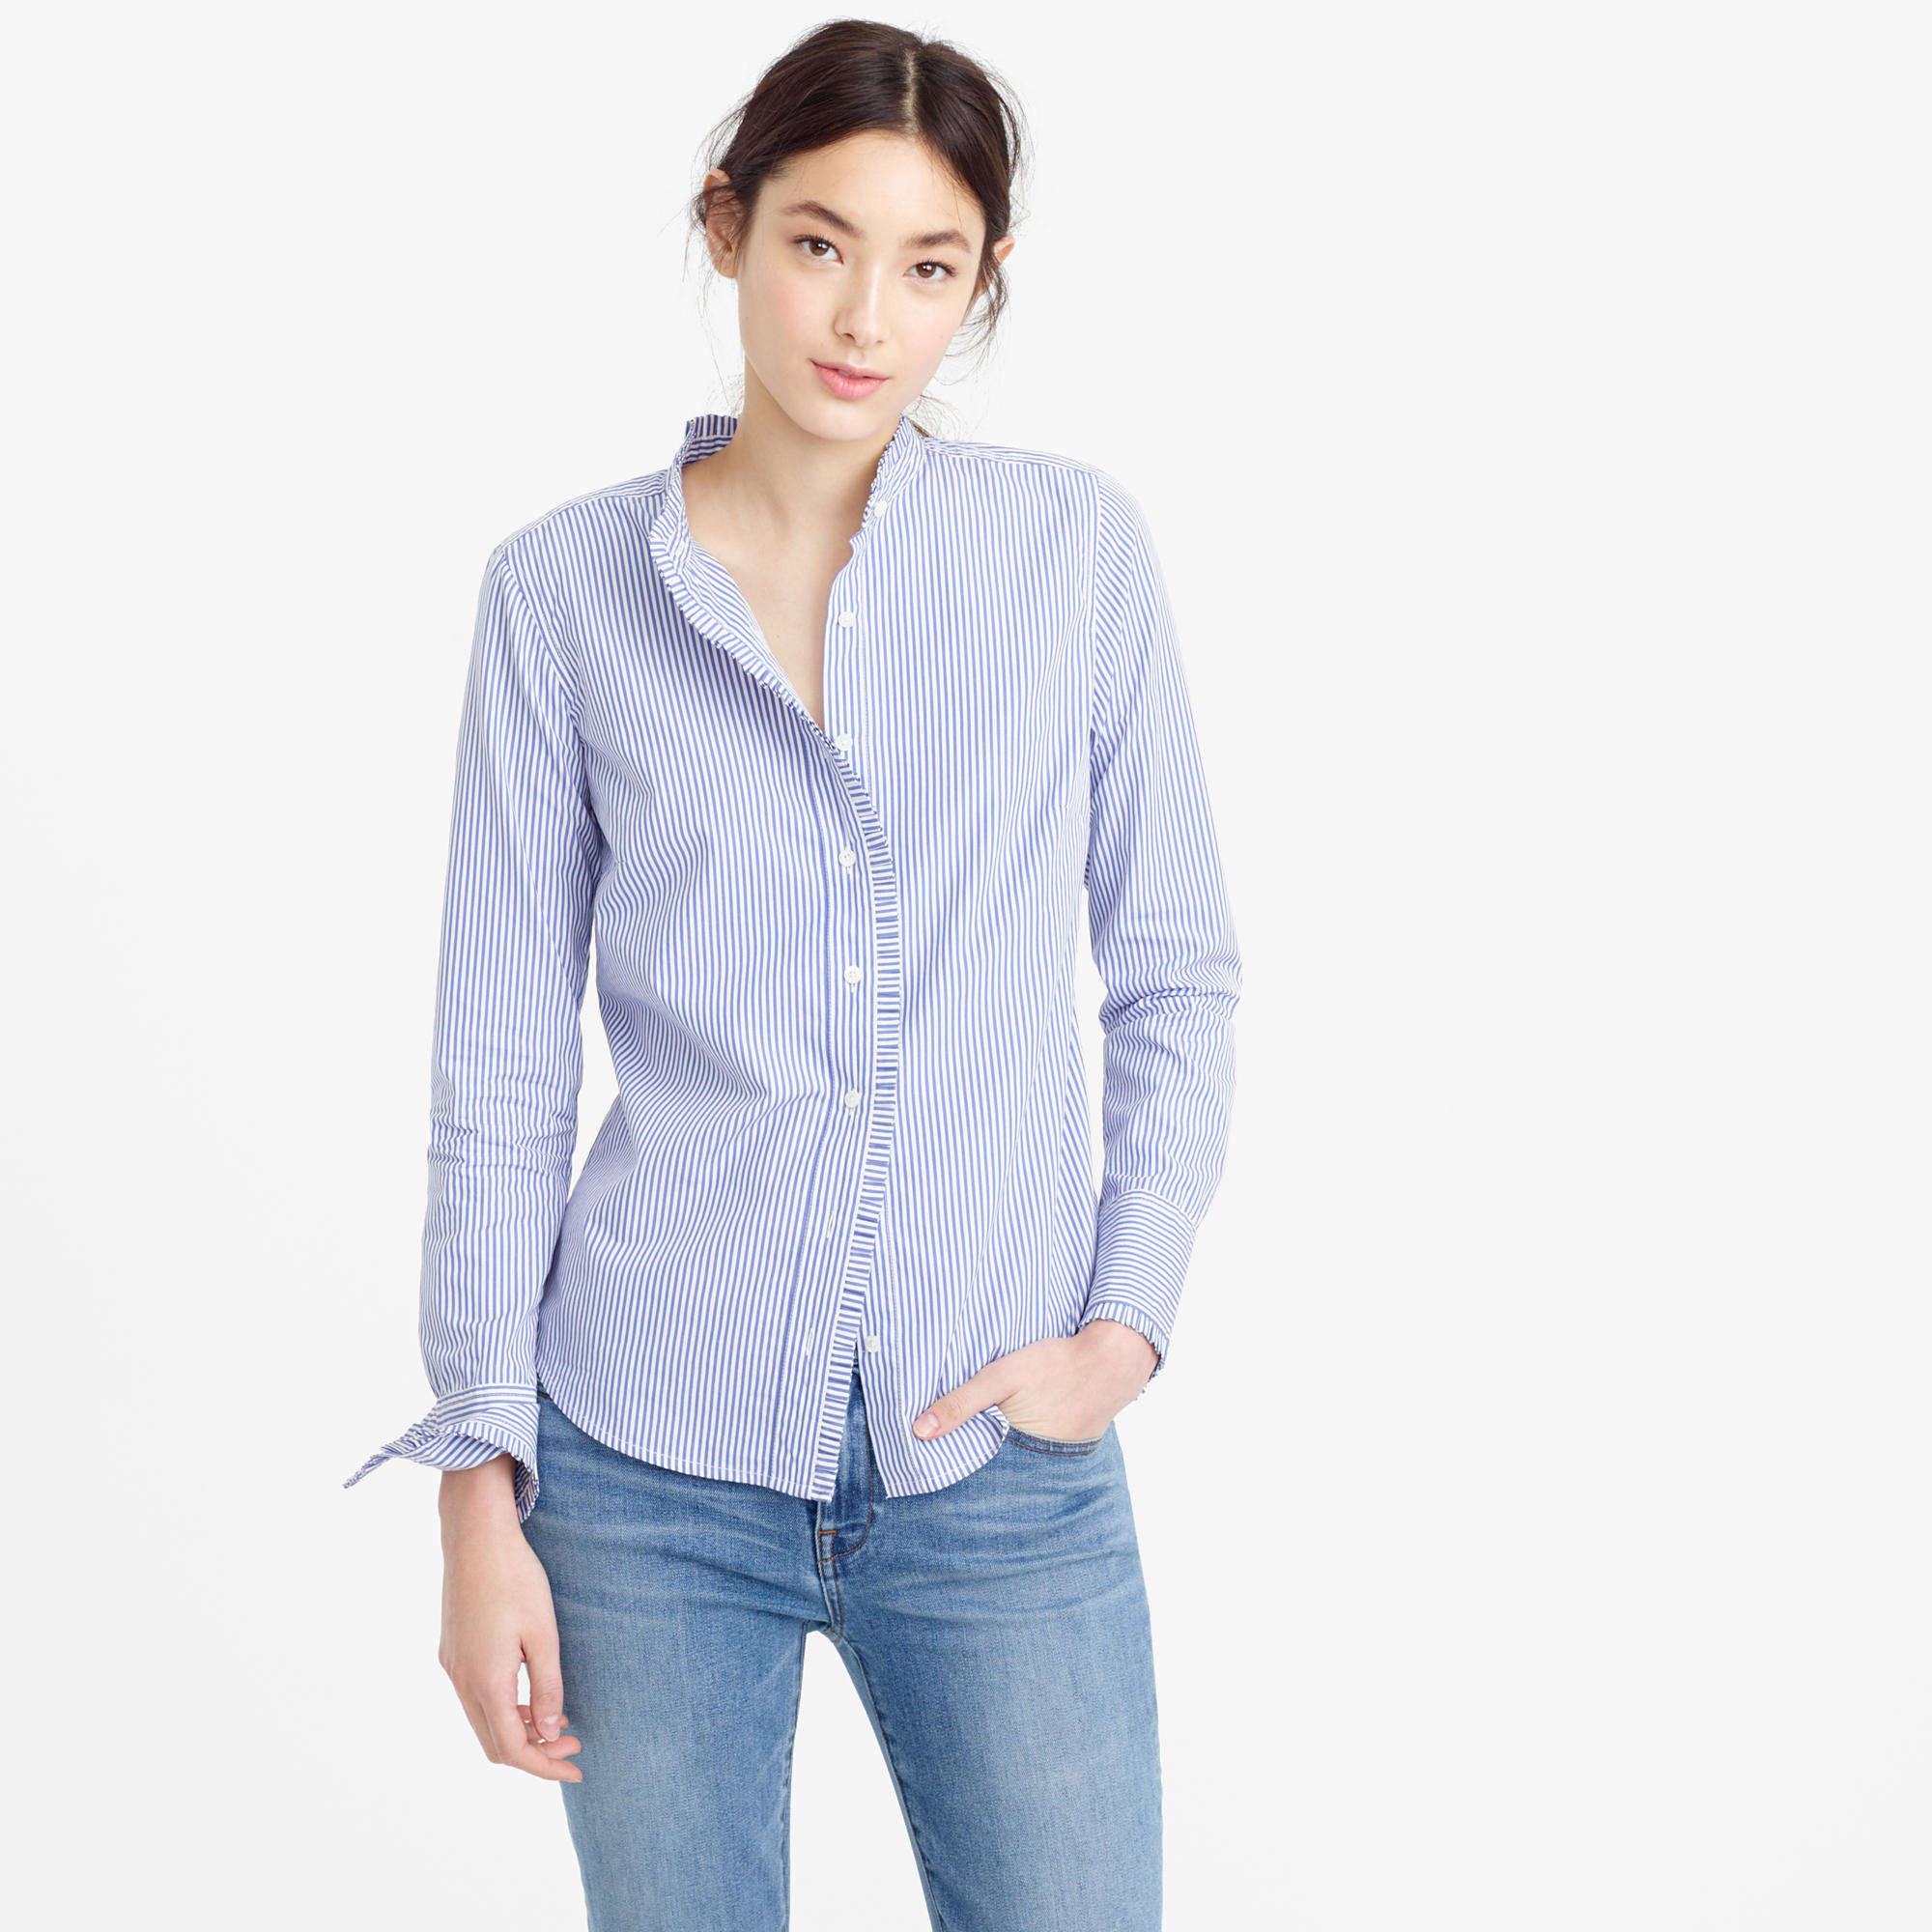 Lyst J Crew Petite Ruffled Button Up Shirt In Stripe In Blue